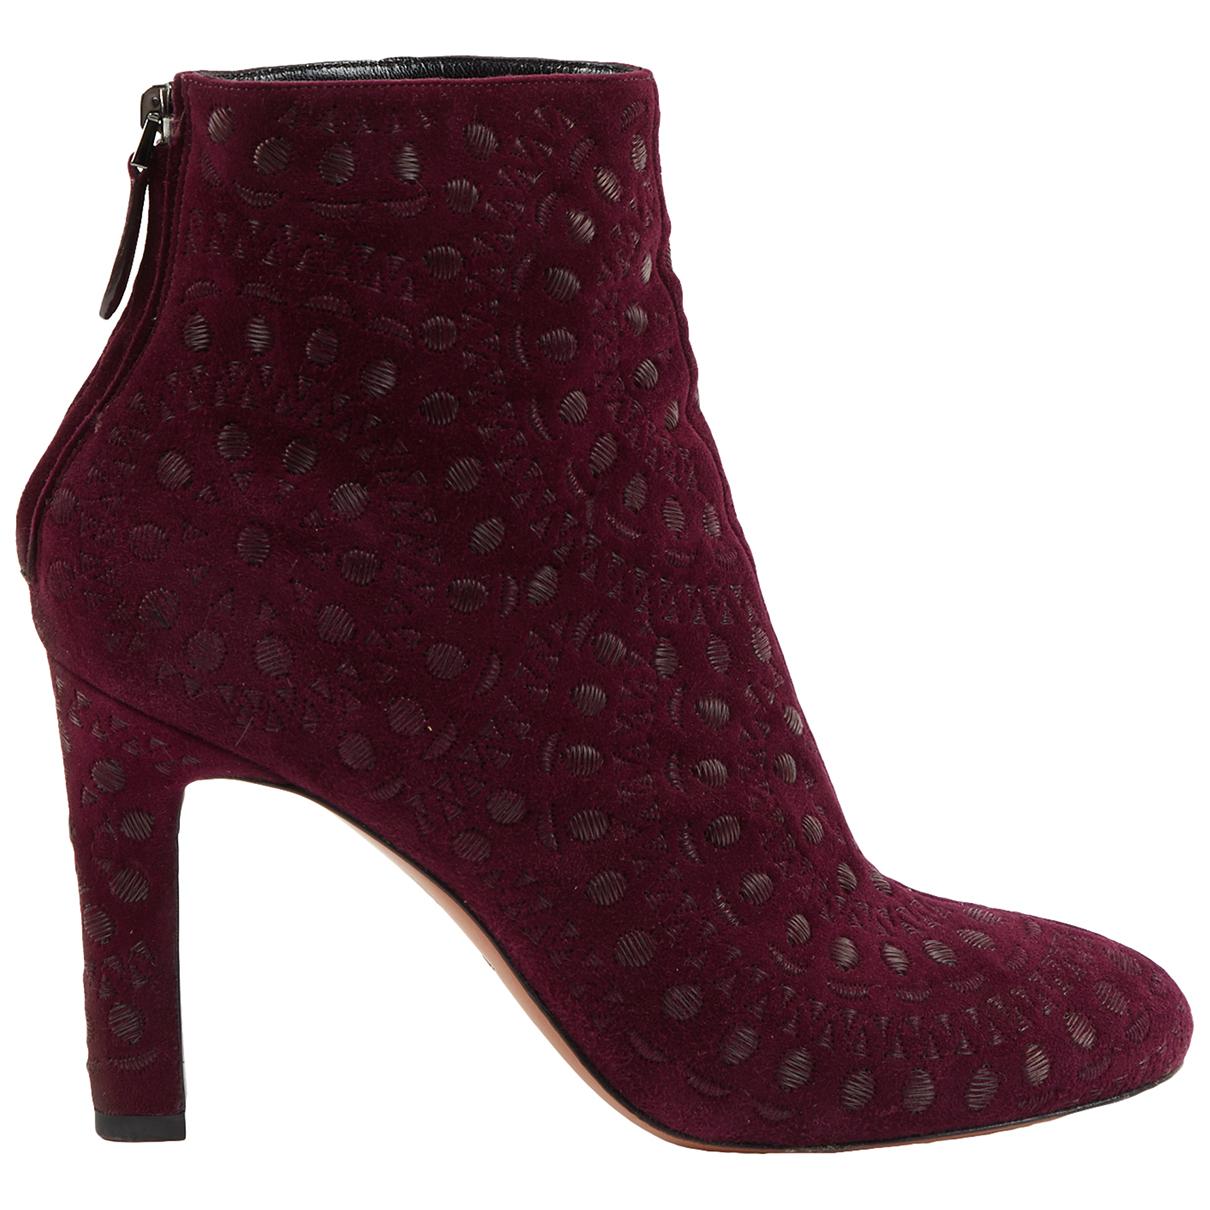 Alaïa \N Burgundy Suede Ankle boots for Women 39 EU